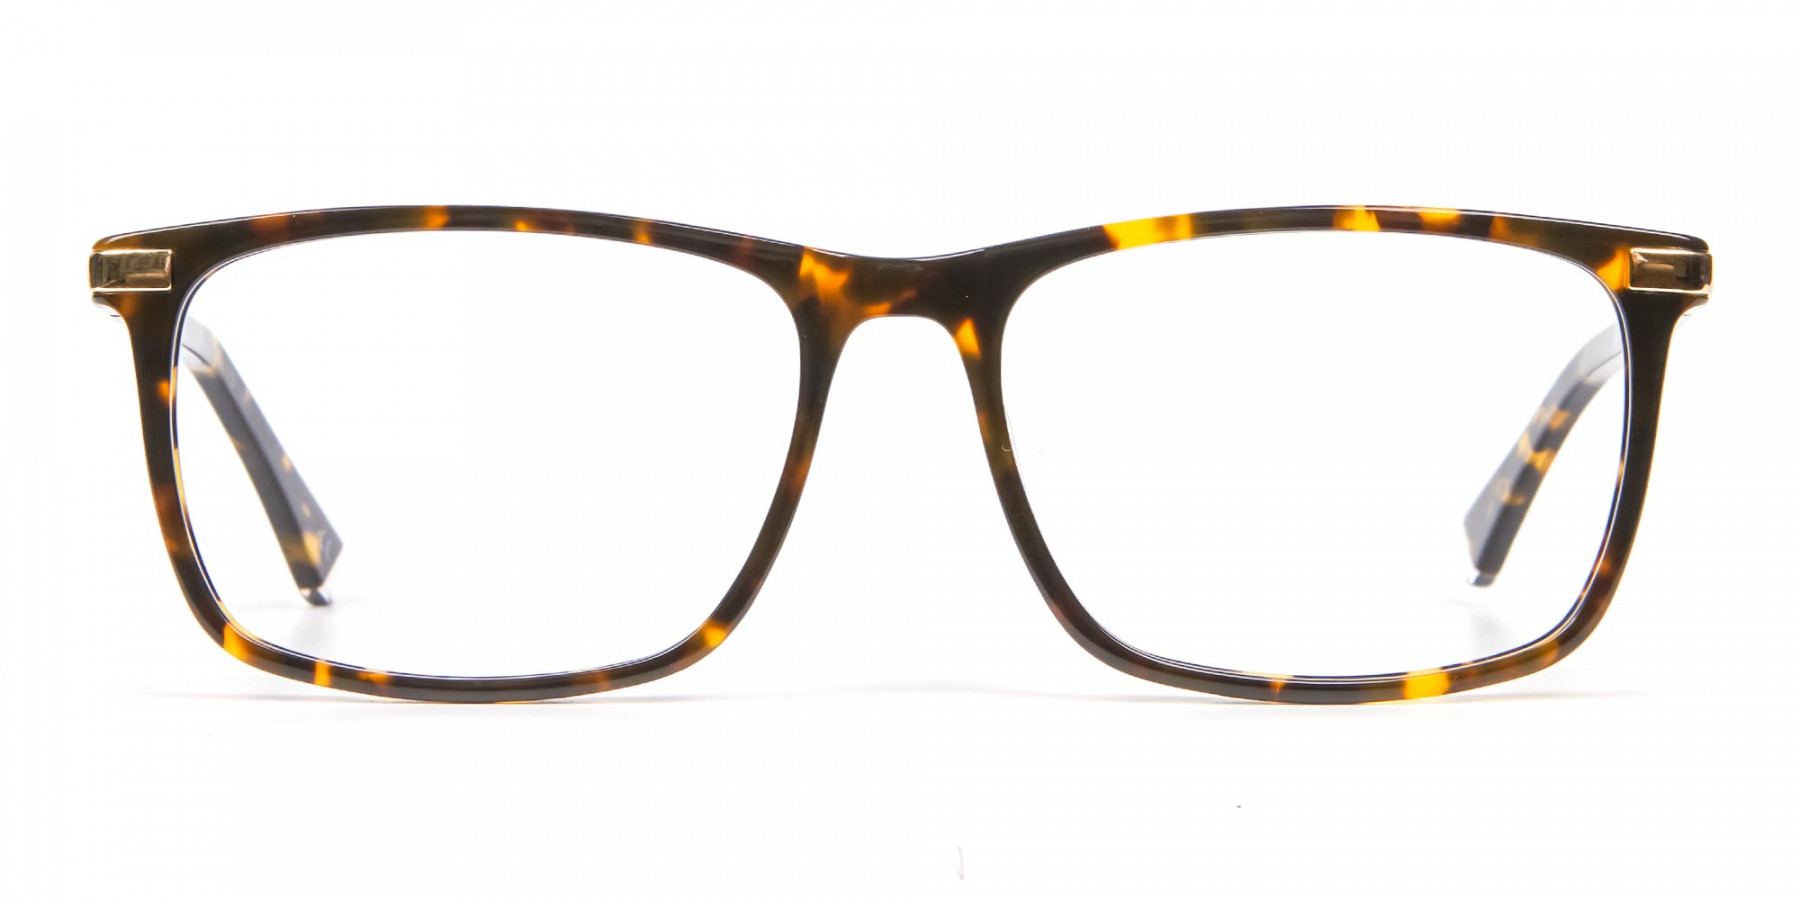 Tortoiseshell Glasses with Gold Hinge - 1